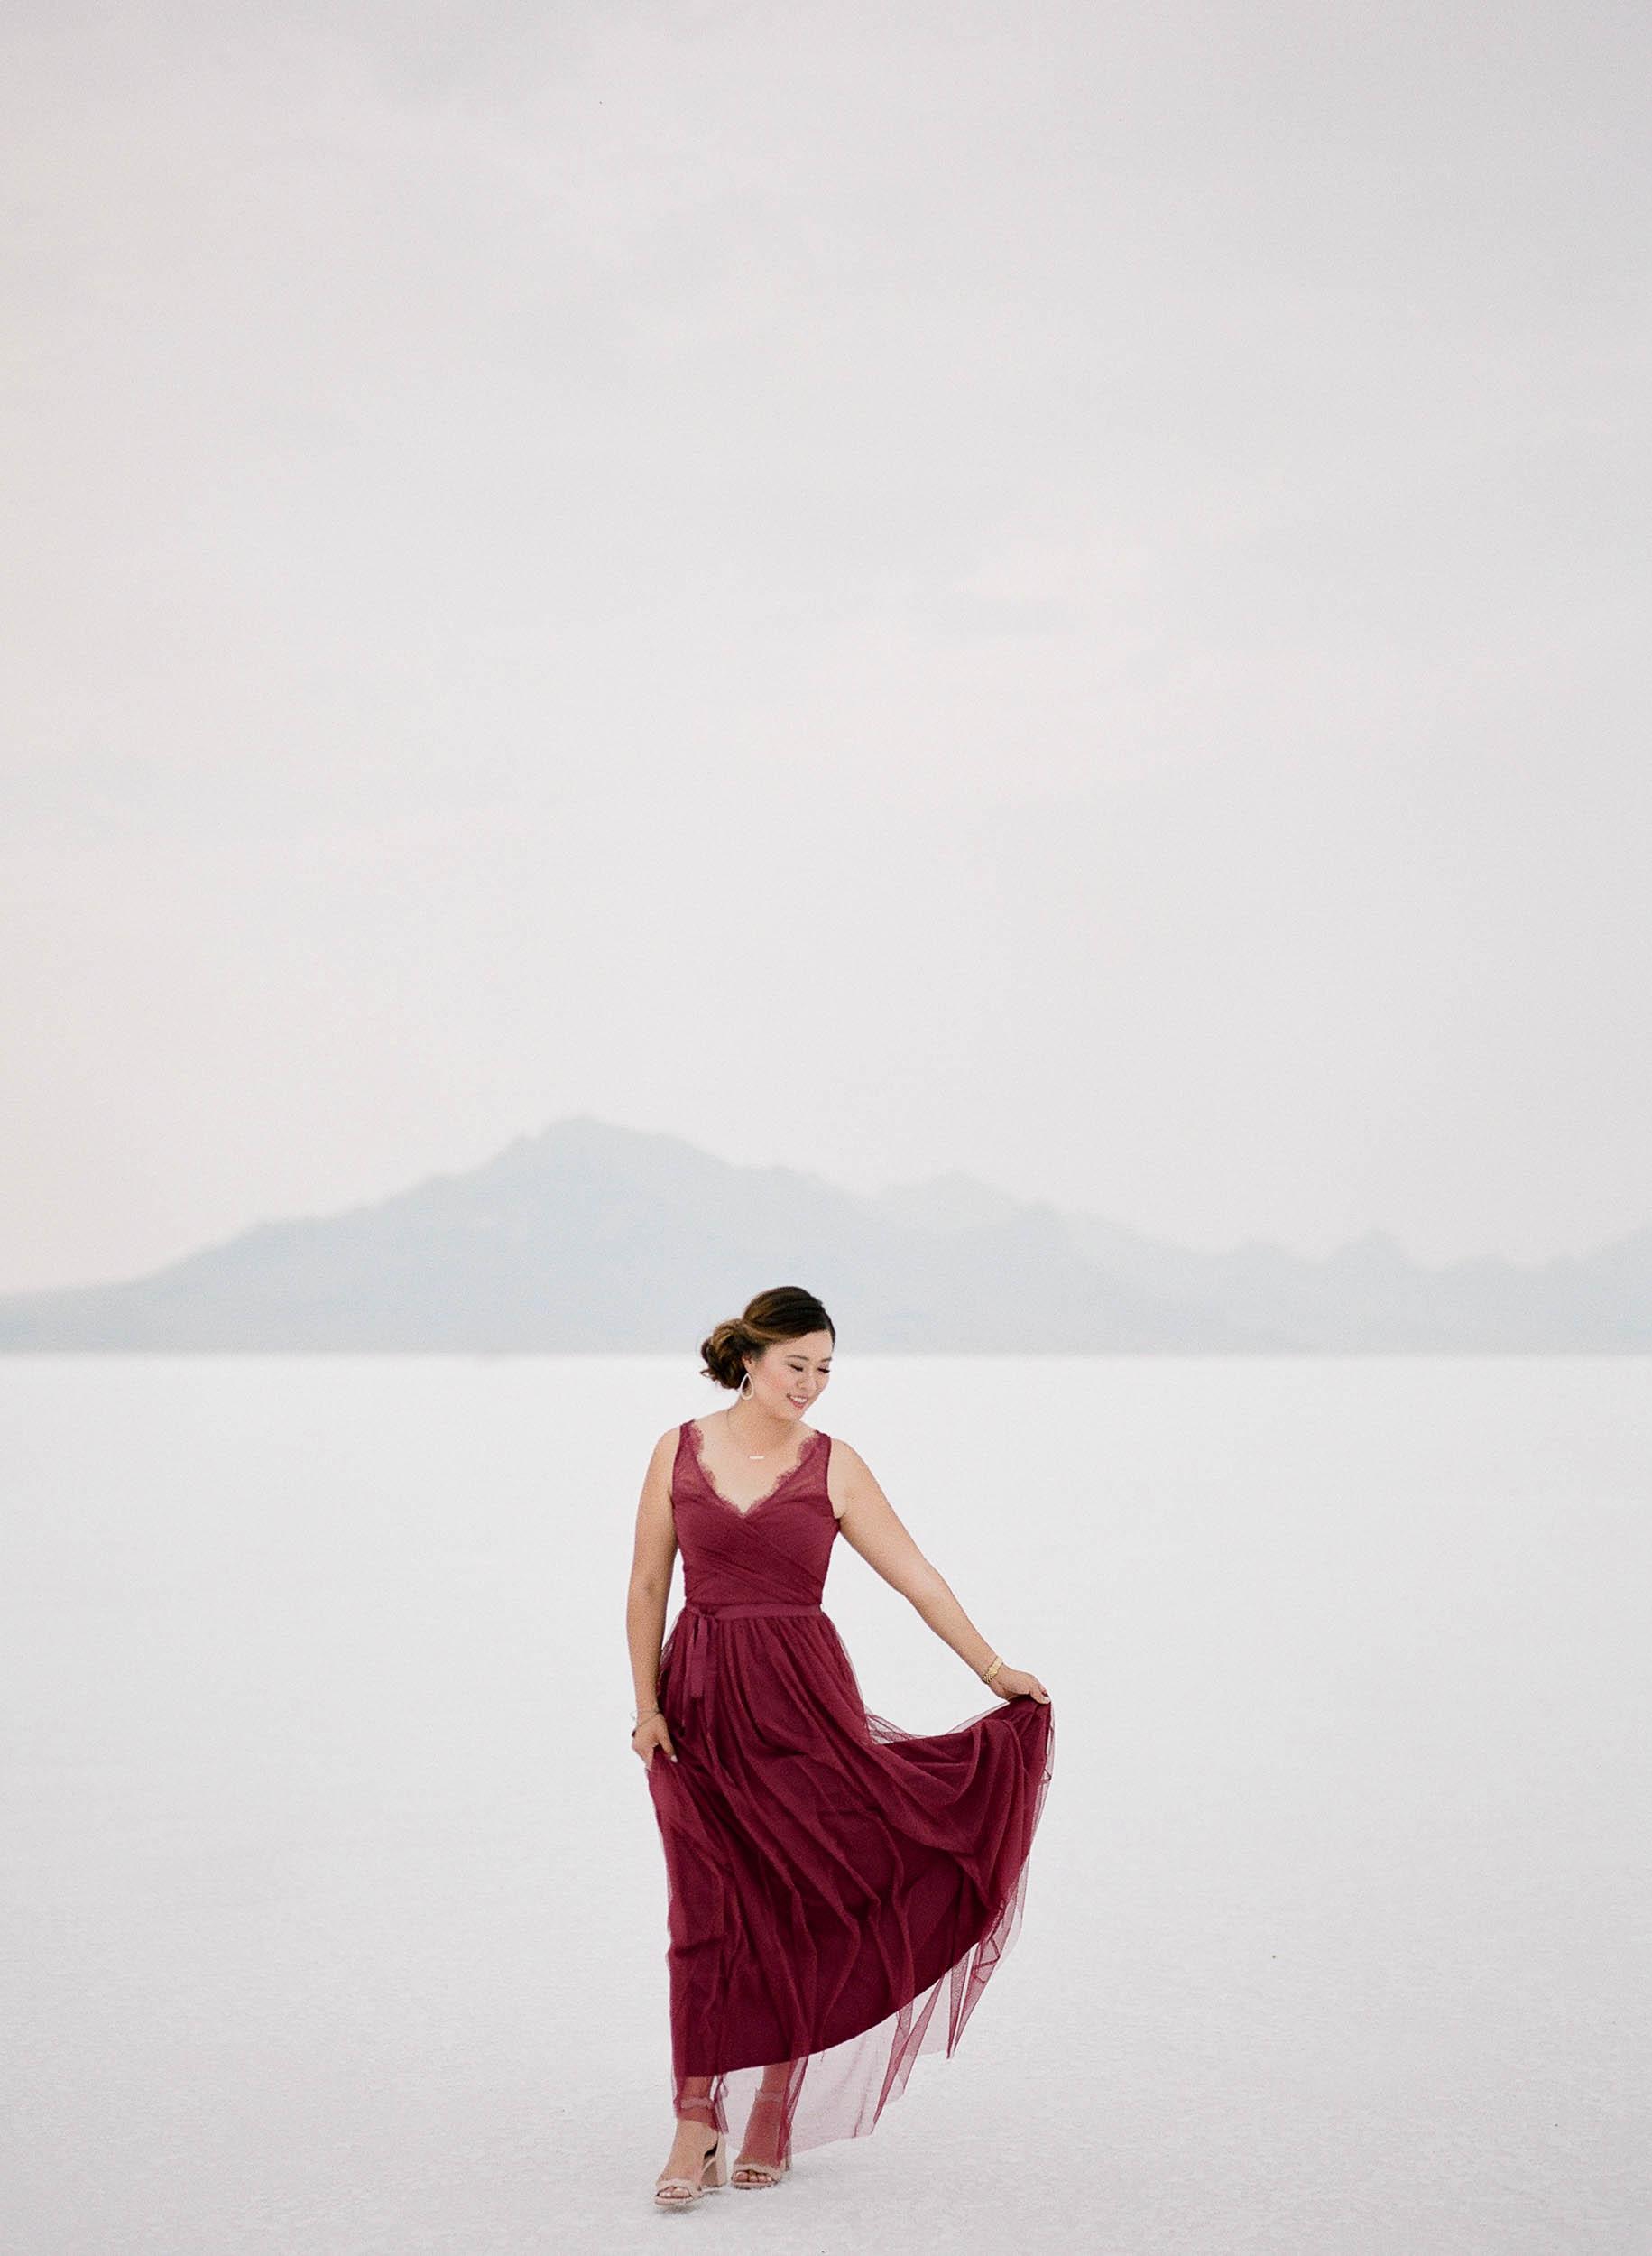 070918_Sandy A La Mode_Family_Utah Salt Flats_Buena Lane Photography_F400_02.jpg